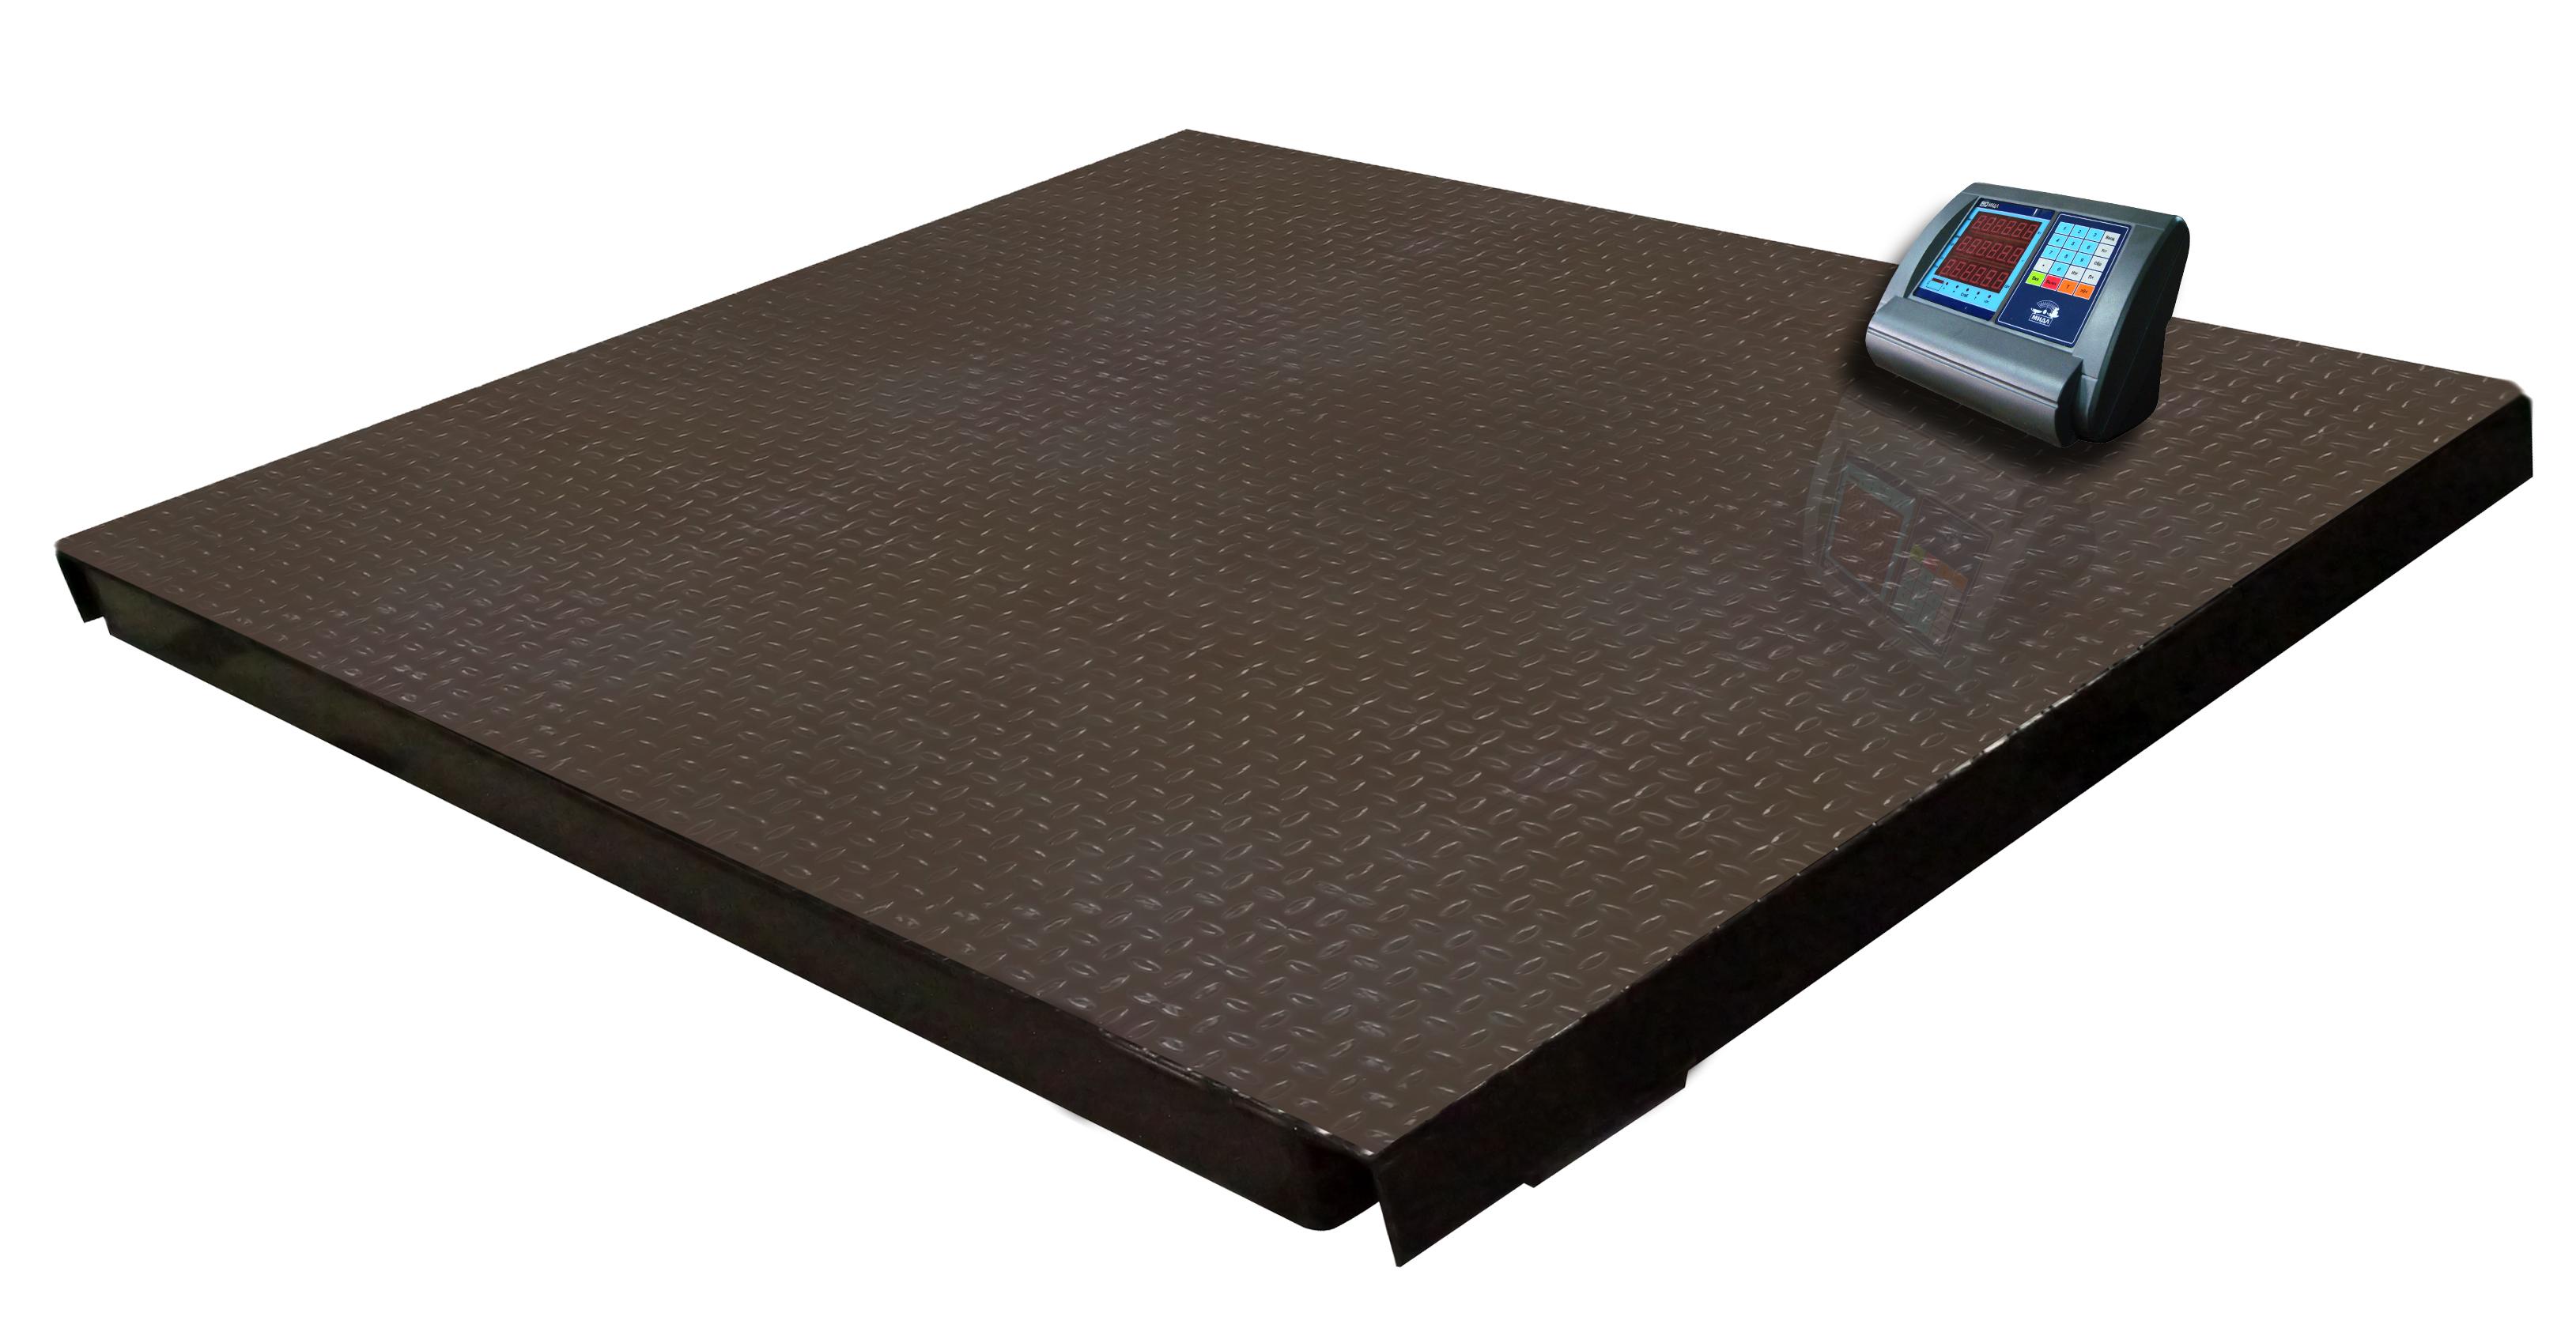 Платформенные весы МП 3000 ВЕД(Ж)АФ1(500;1500х1500) циклоп 012С